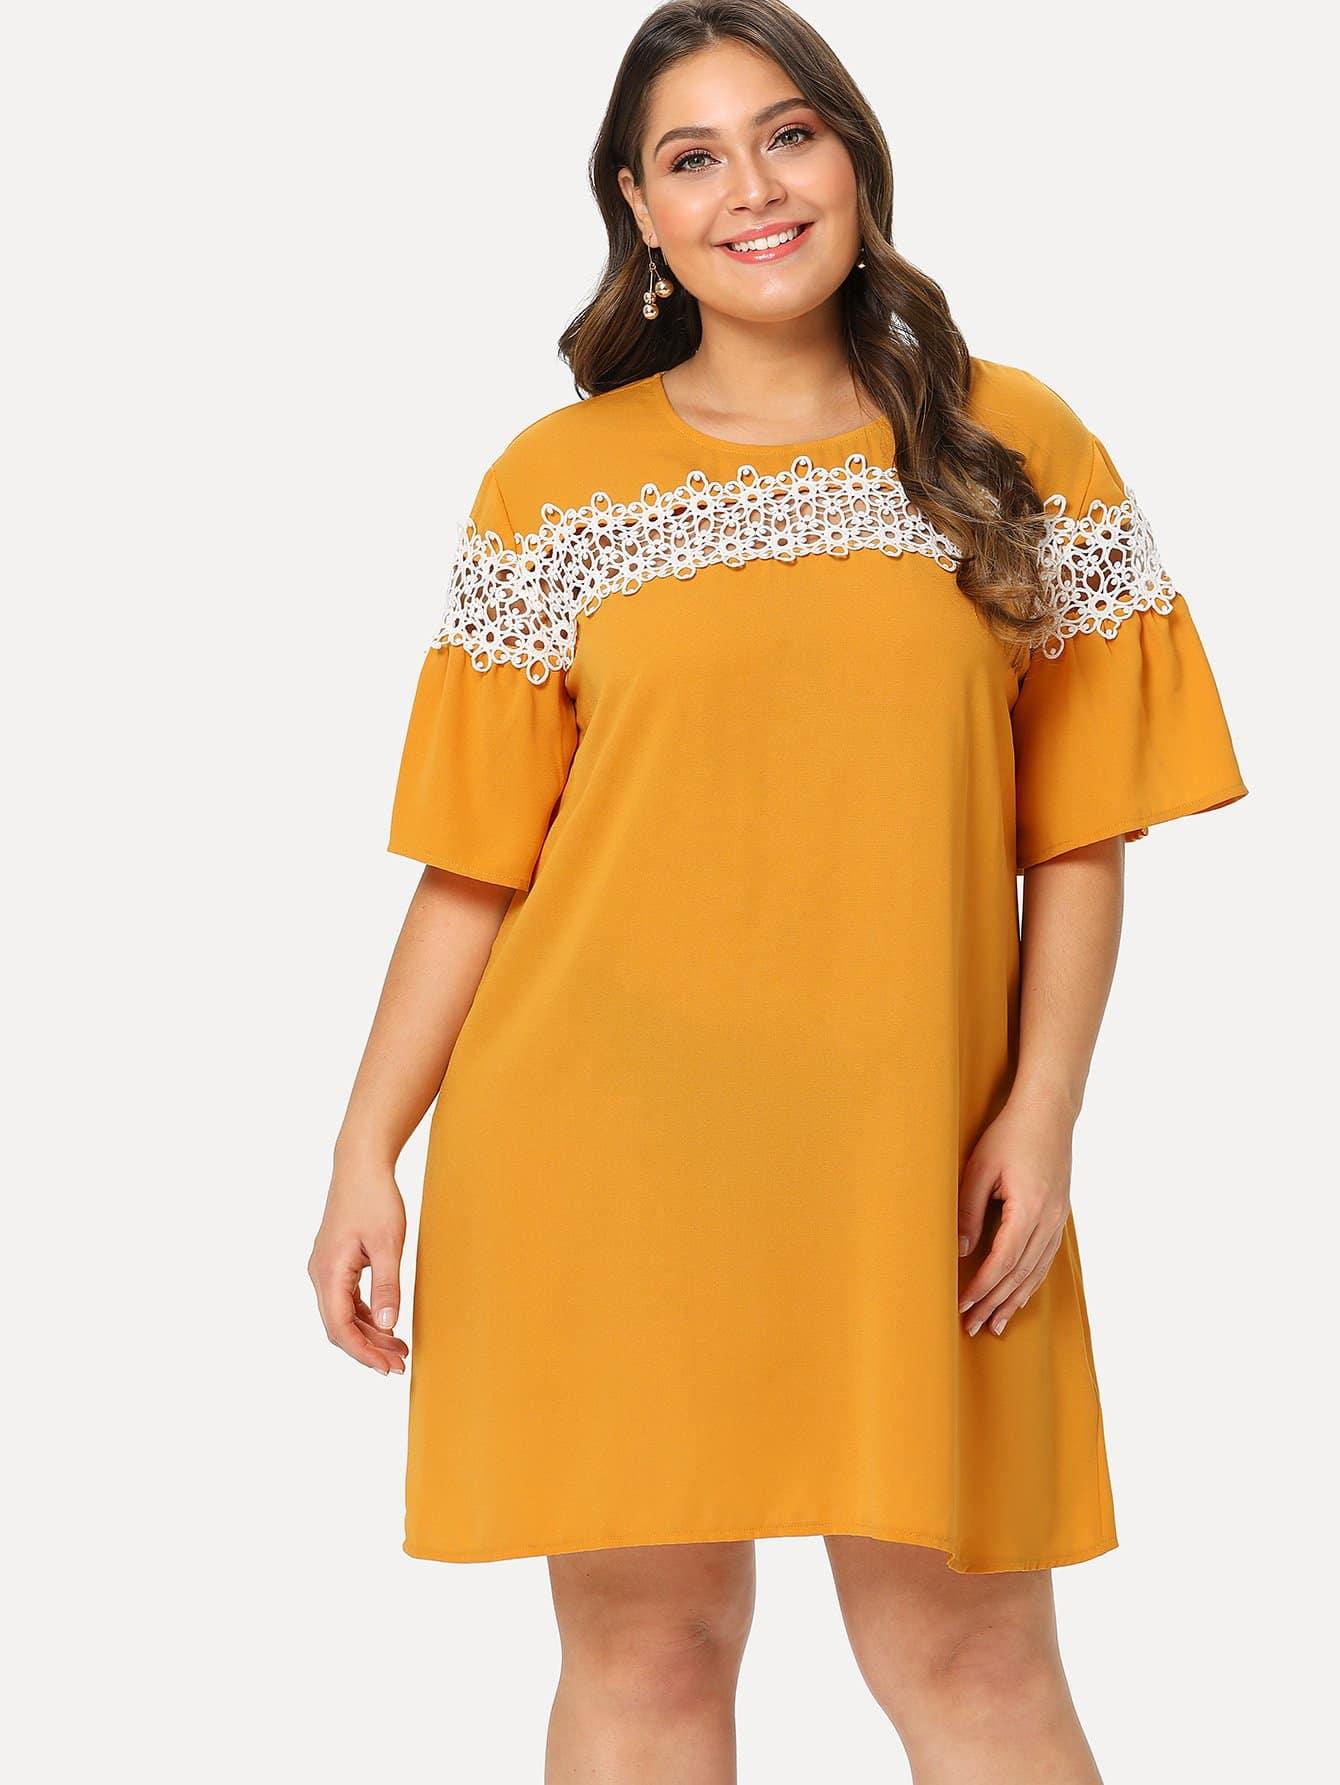 Contrast Lace Applique Tunic Dress contrast collar lace applique pleated pinstripe dress